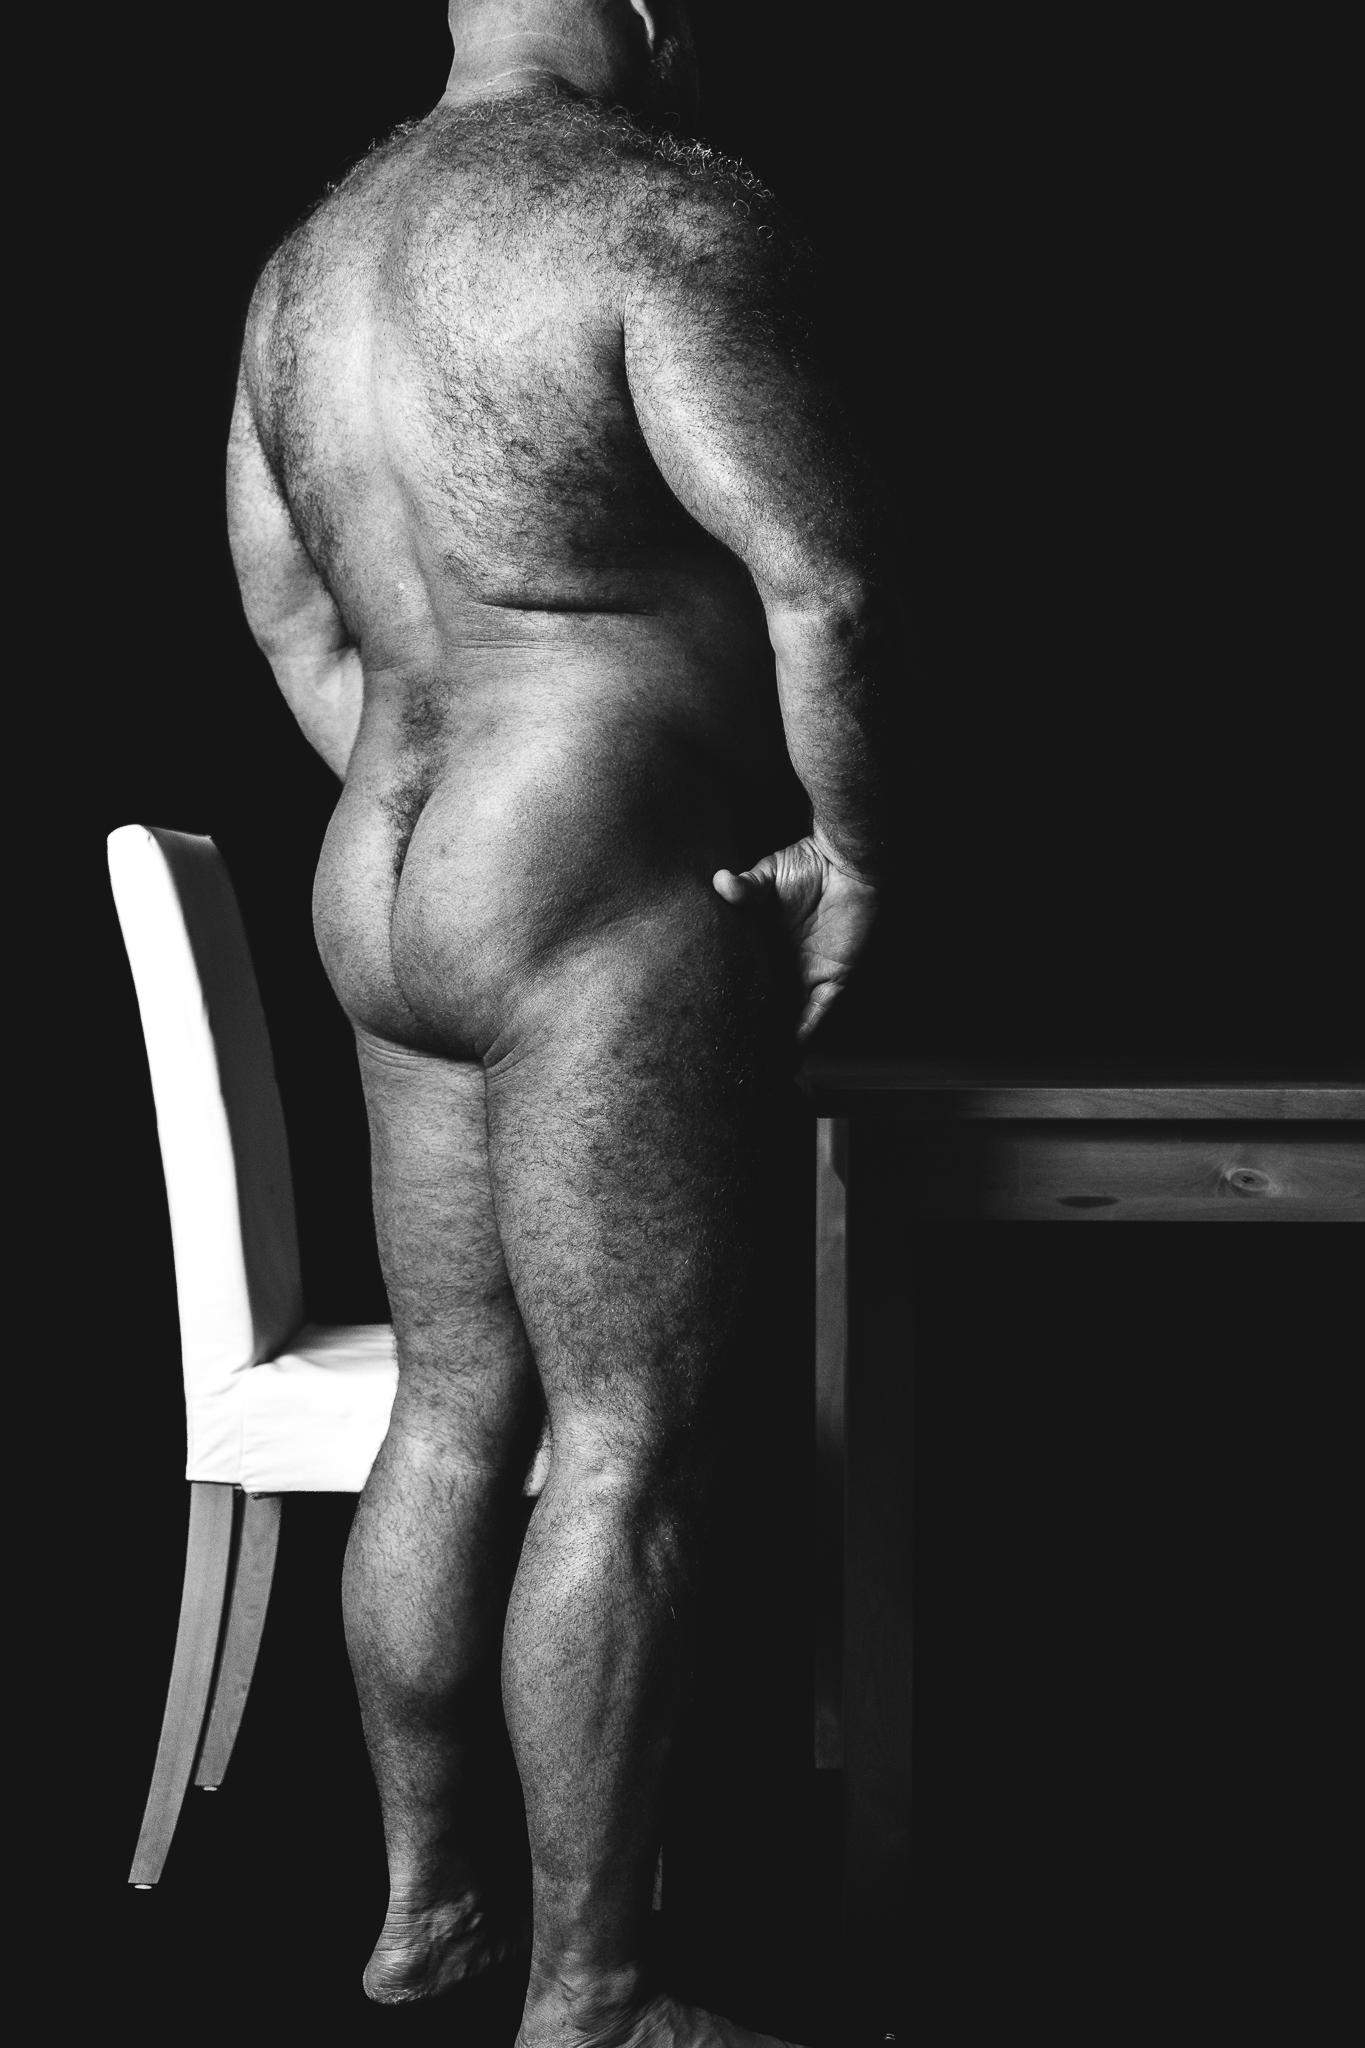 Sexy Sunday Photography Book-20161105-untitled-1842371.jpg